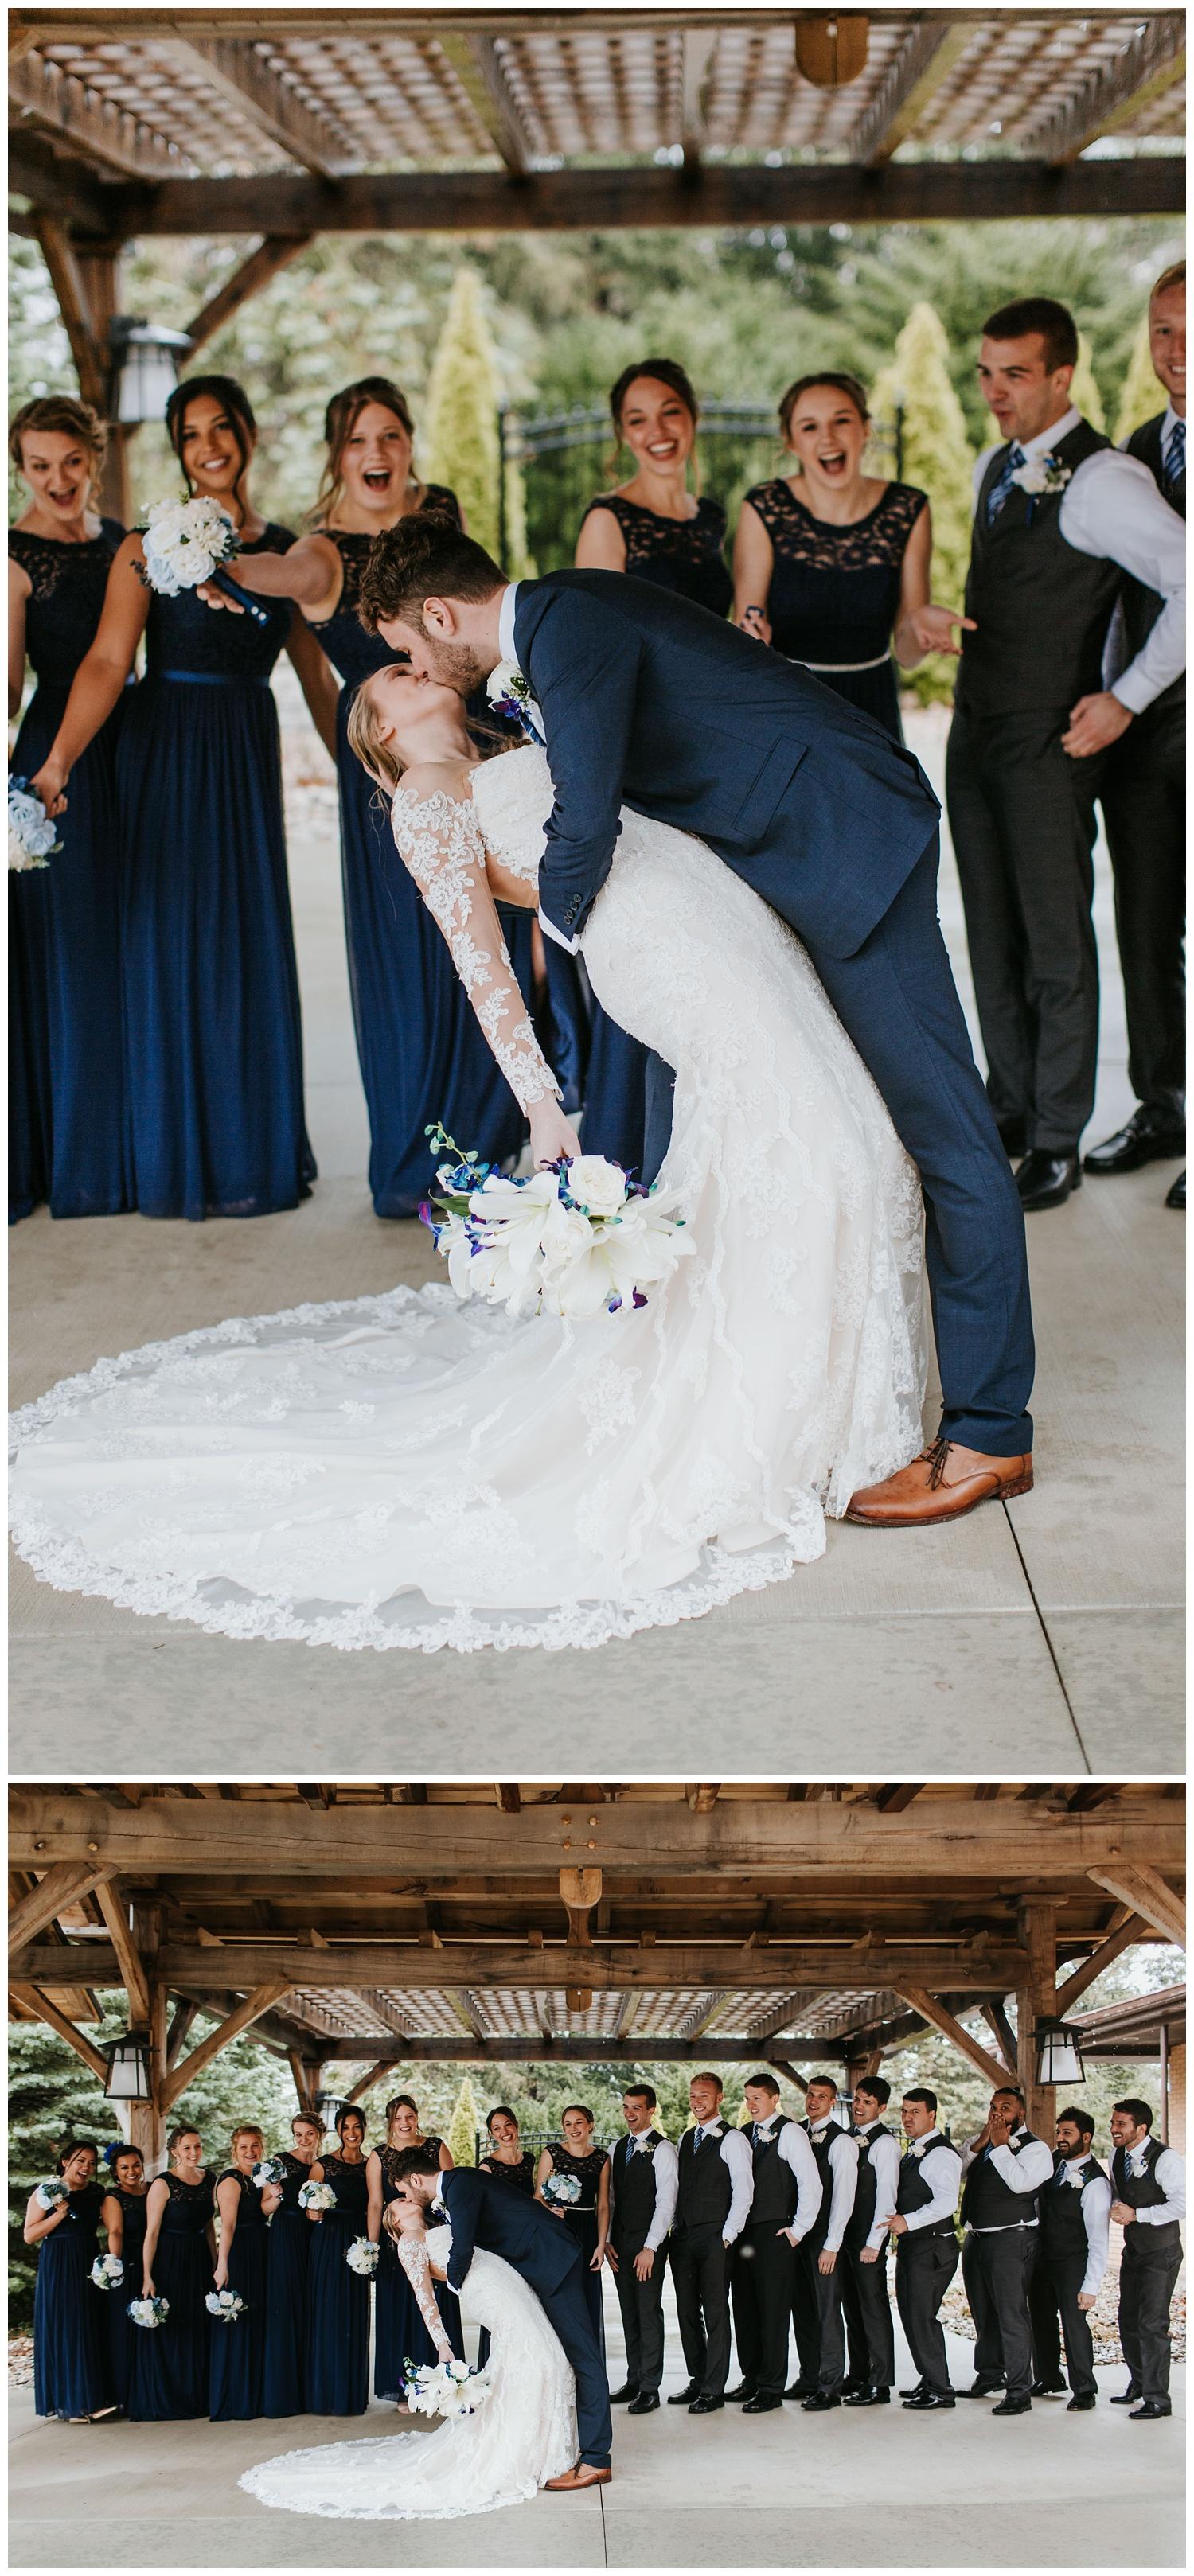 Shadowland Silver Beach St. Joseph Wedding Photographer Rainy Wedding17.jpg